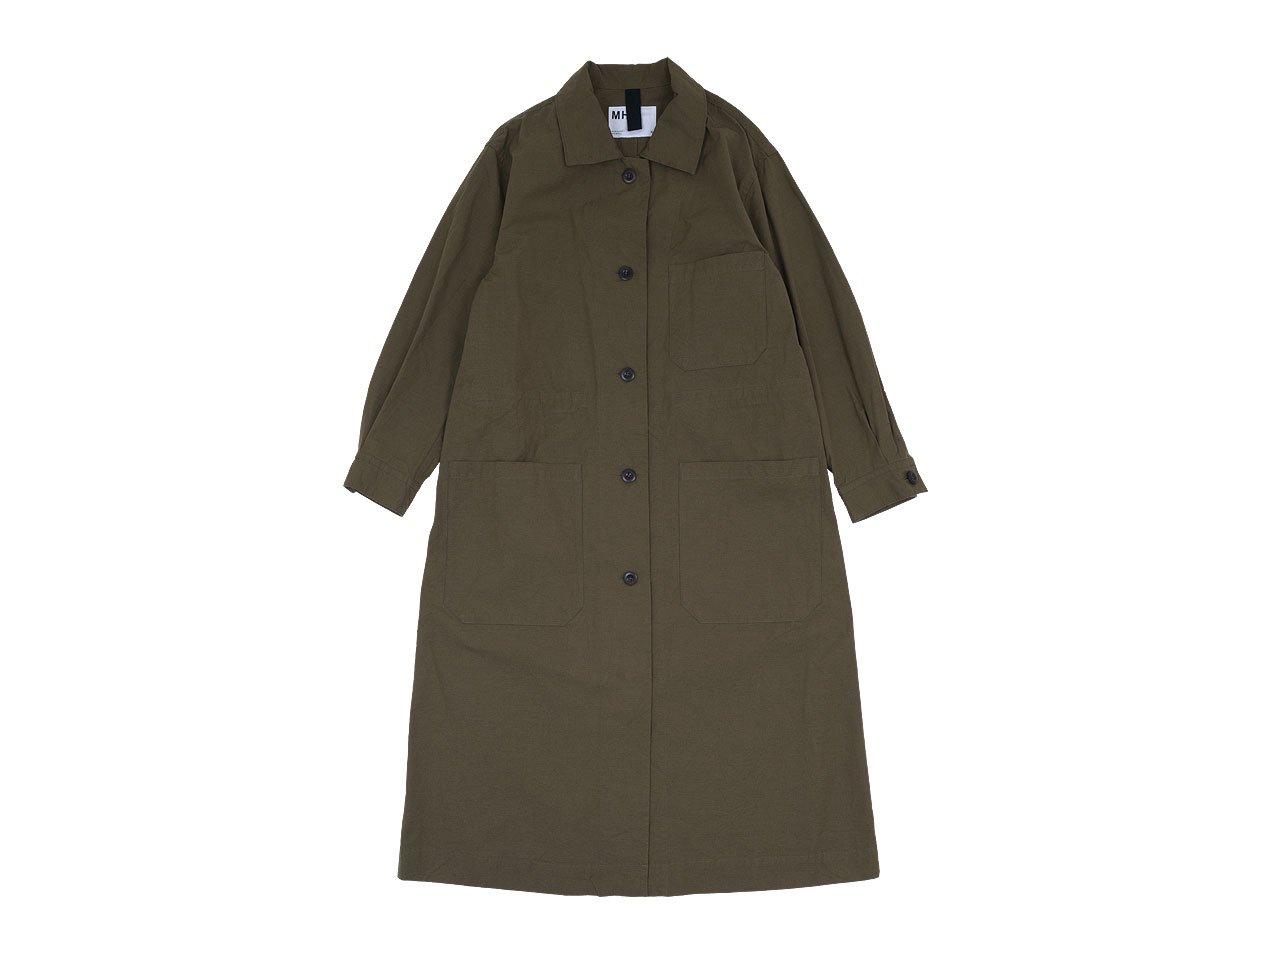 MHL. OVERDYE MELANGE COTTON DRESS 50BROWN 〔レディース〕